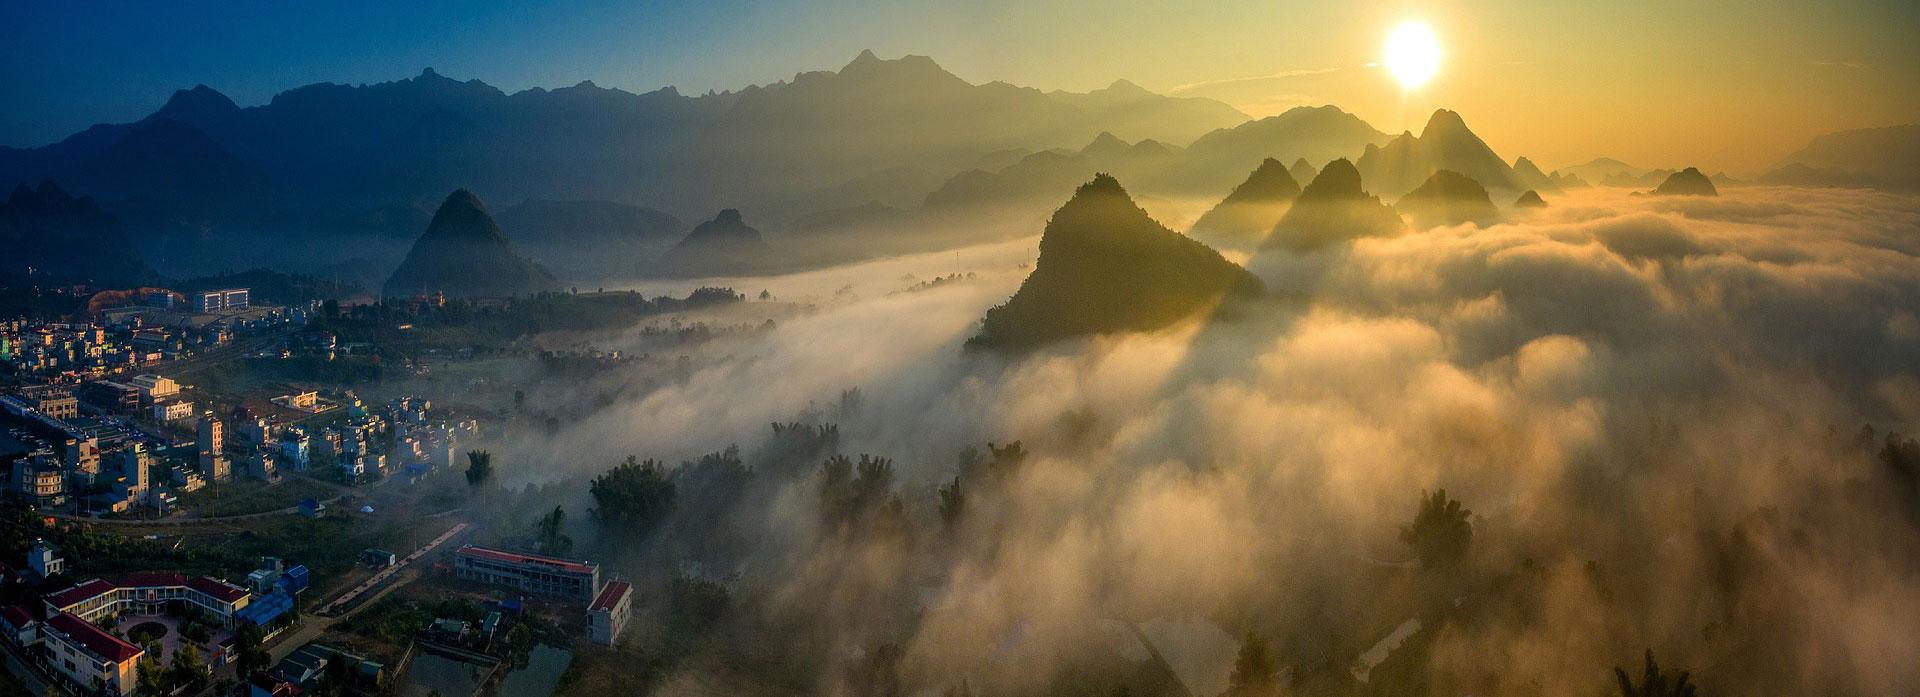 landscape-peaks-vietnam